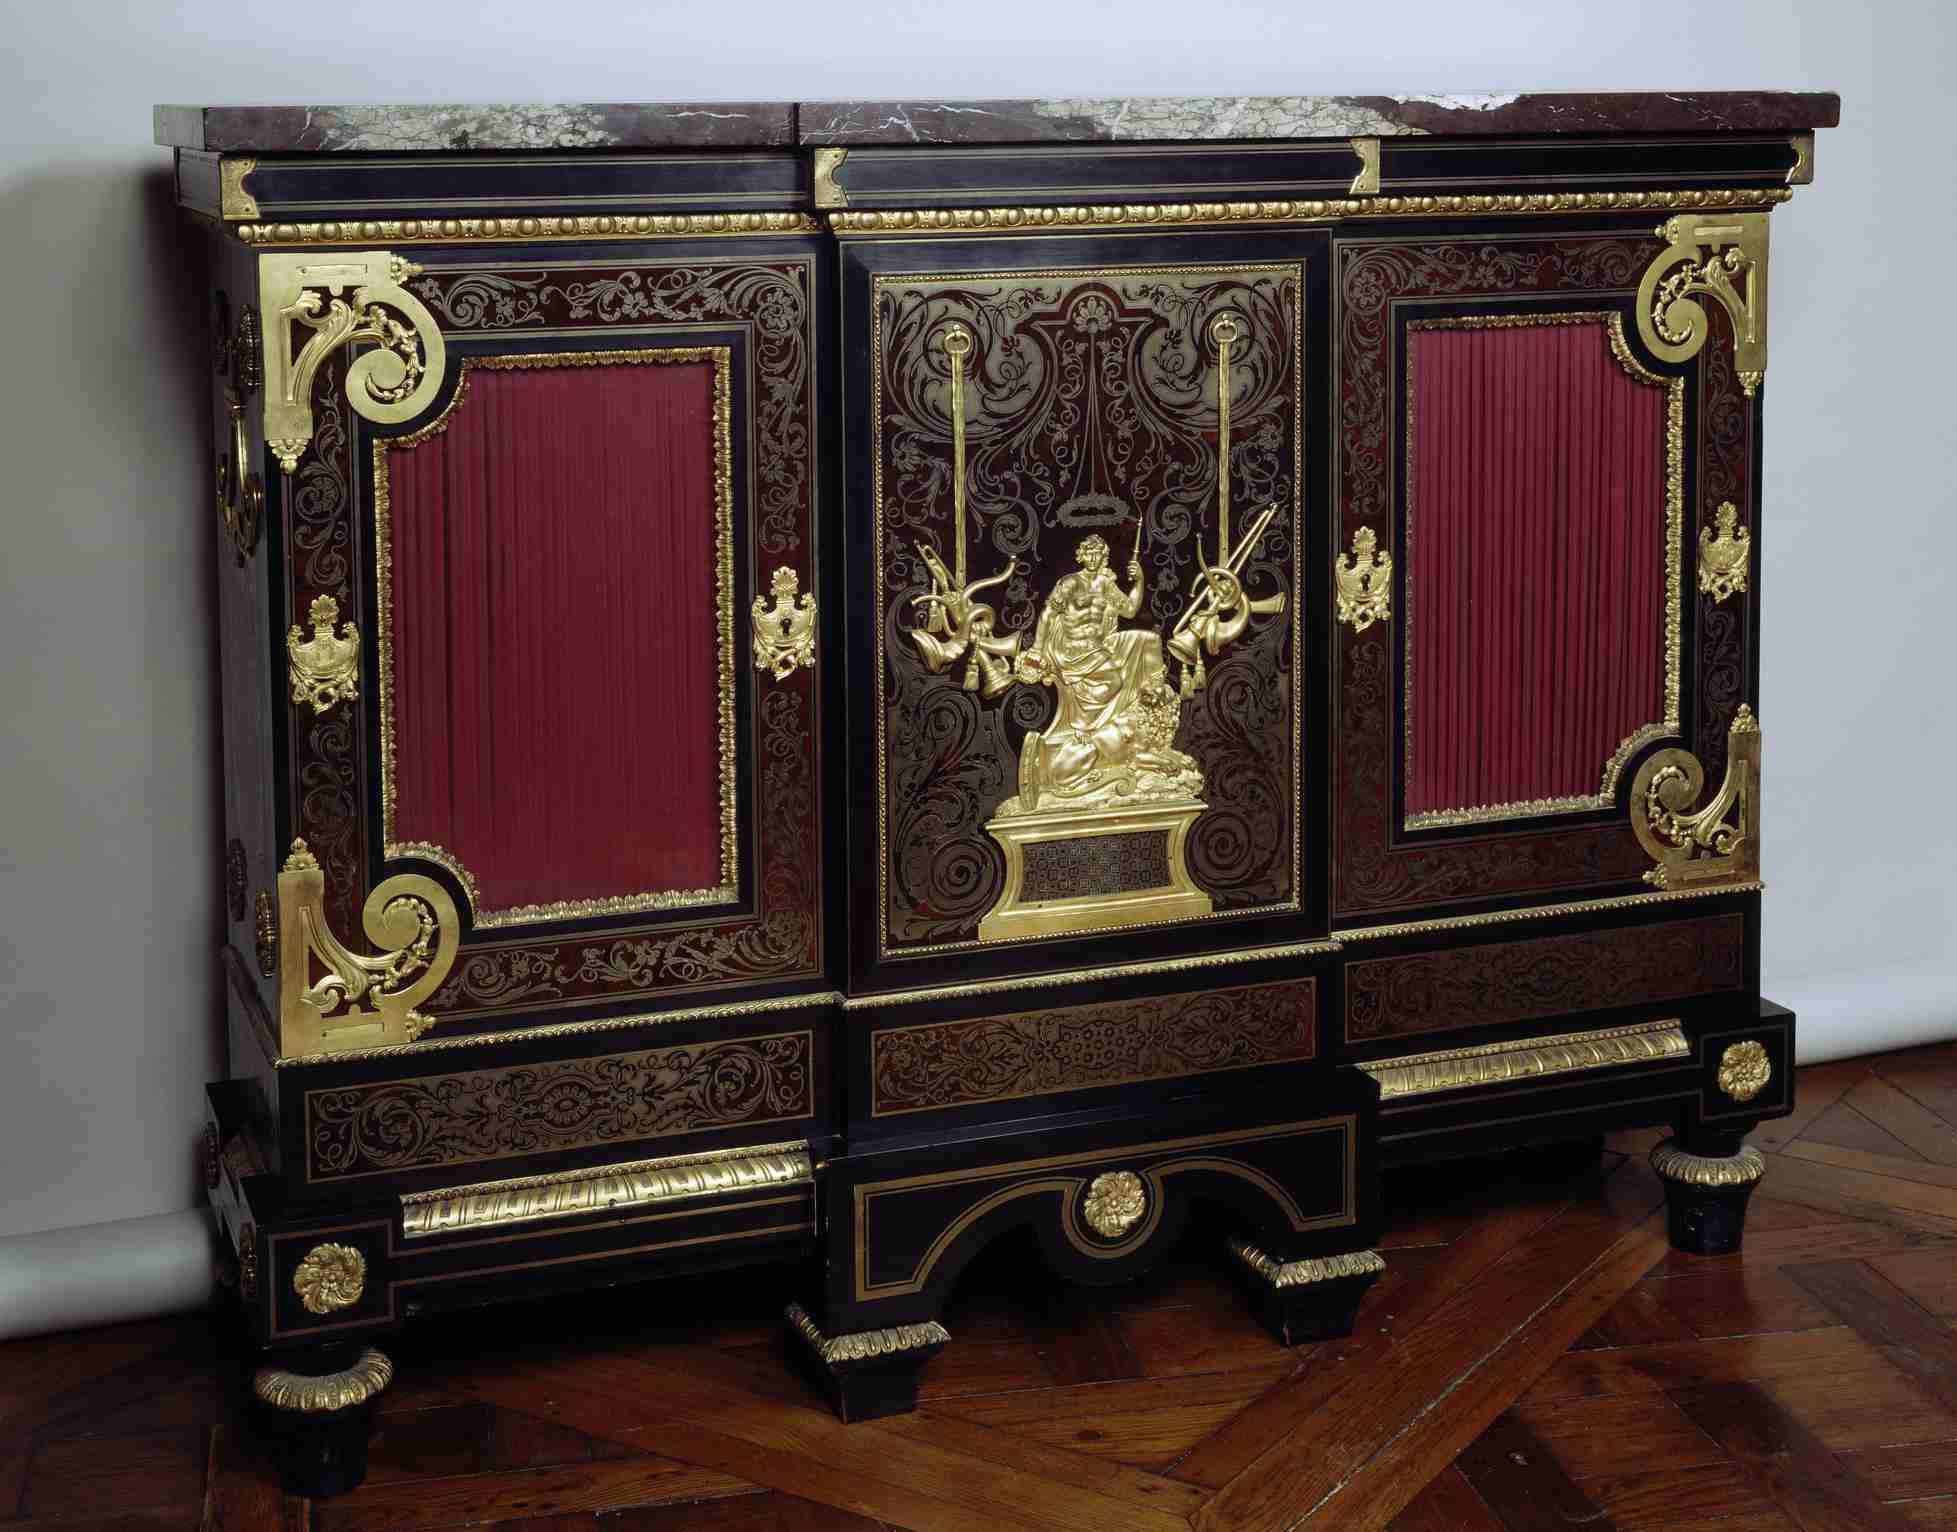 Credenza Definition Webster : Defining confusing antique furniture terms